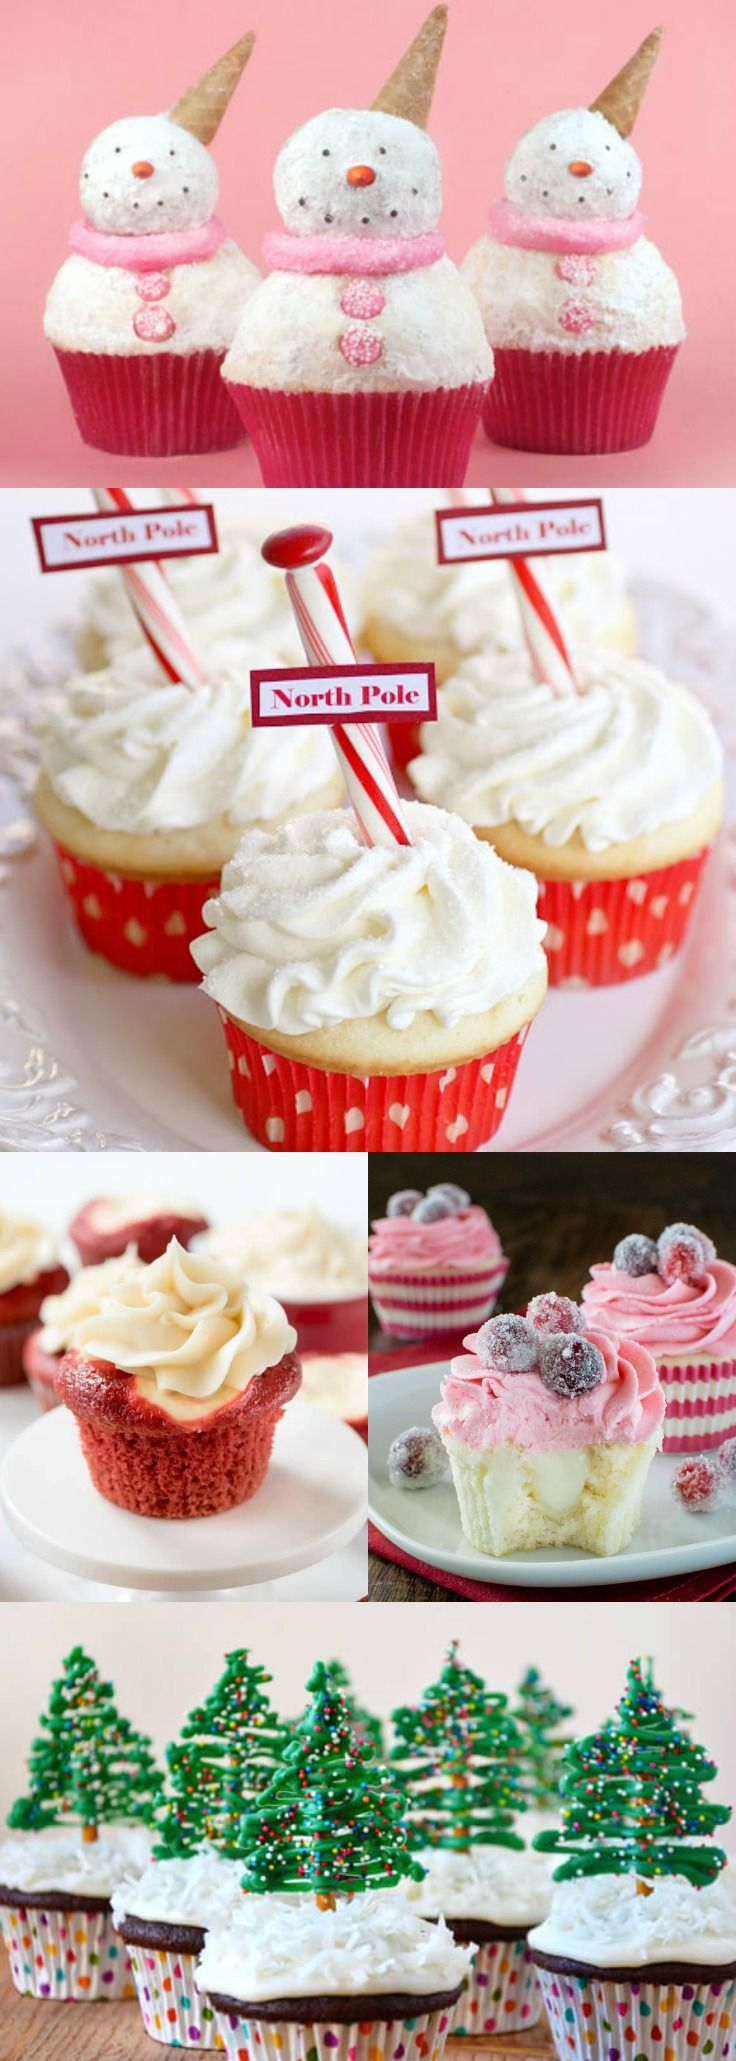 Christmas Cupcake Recipes, Holiday Cupcake Ideas, Christmas Cupcake Decorating